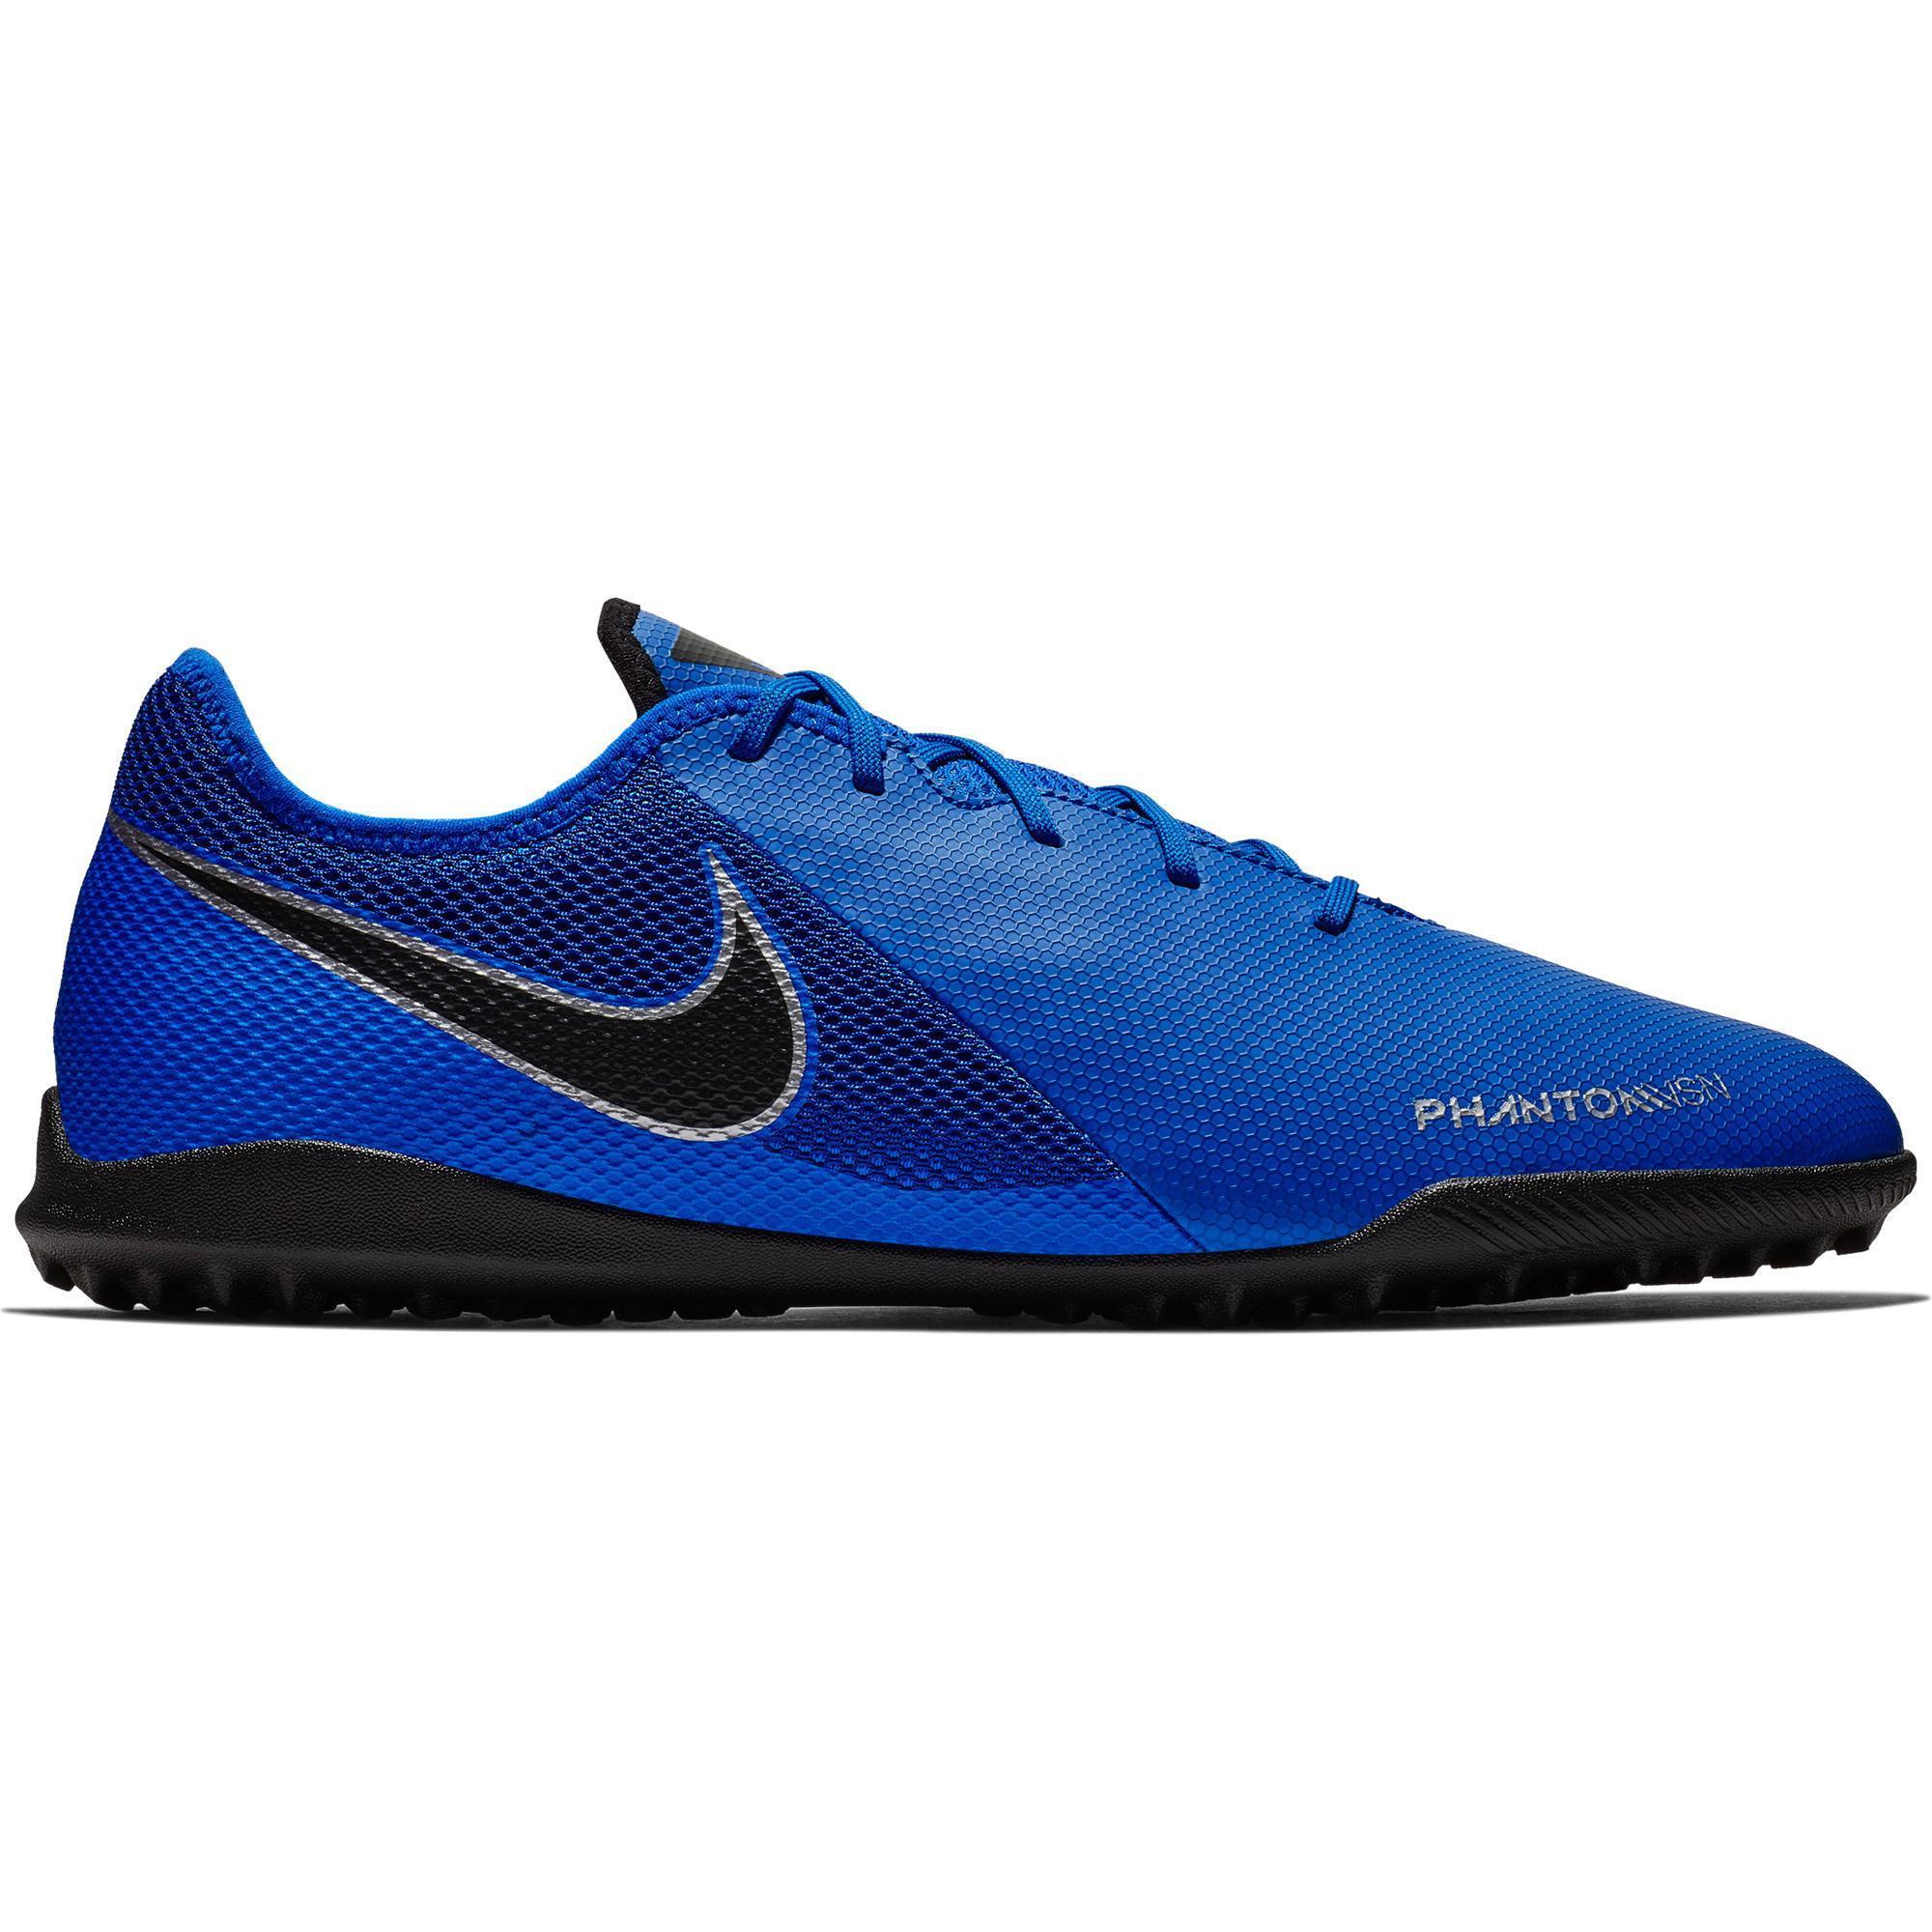 Nike Voetbalschoenen Phantom Vision Academy TF blauw